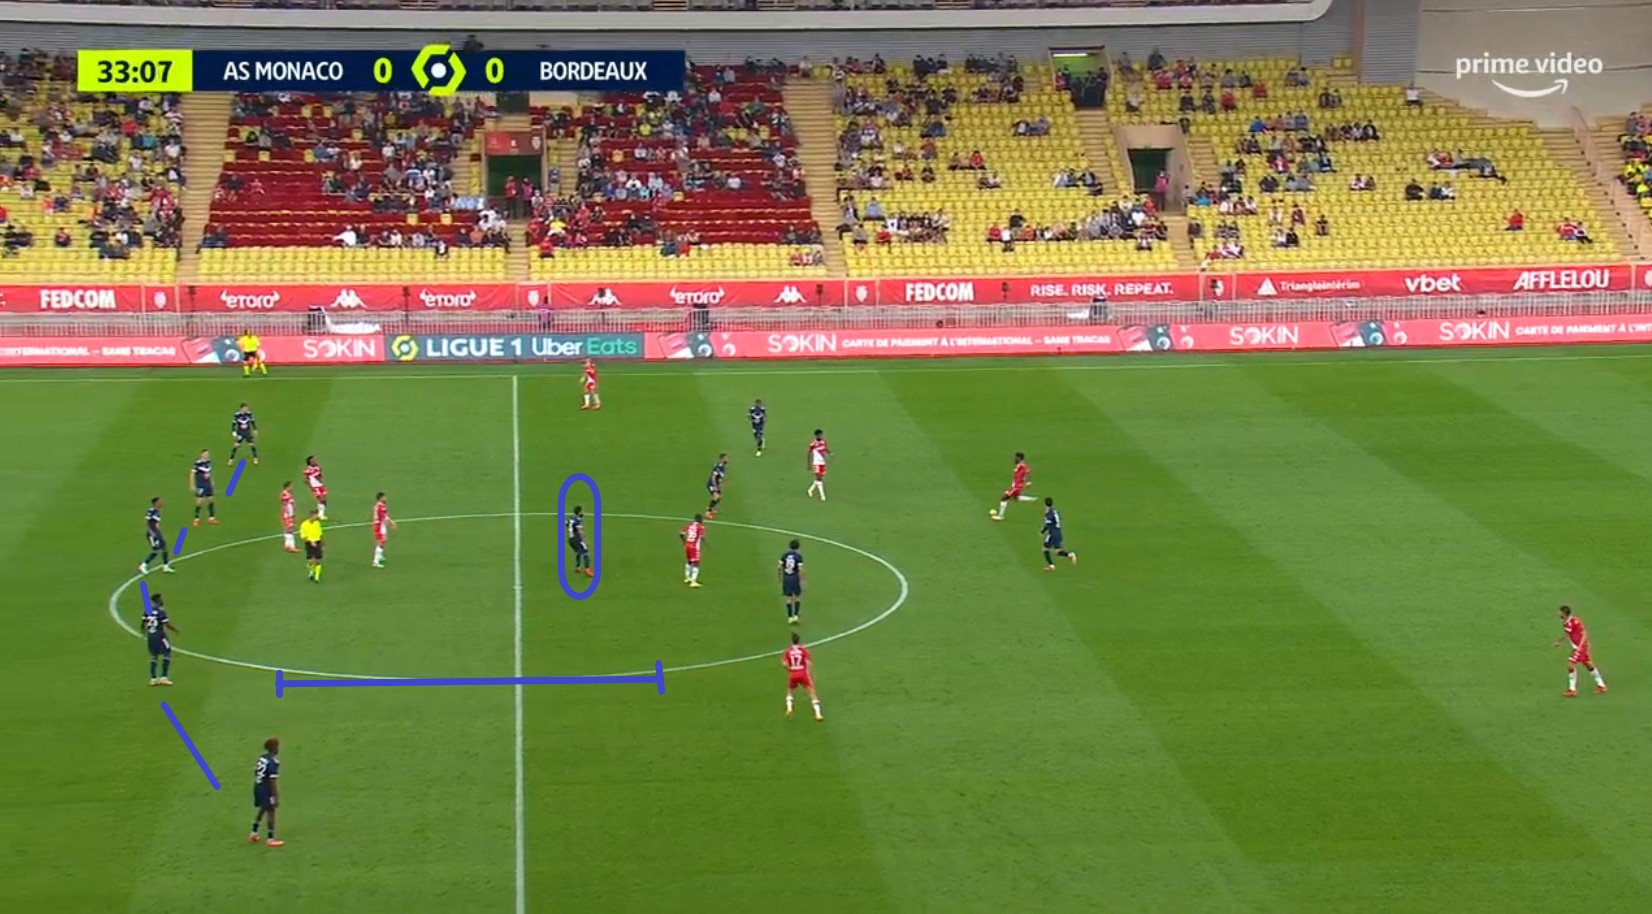 Monaco2_3.jpg (298 KB)